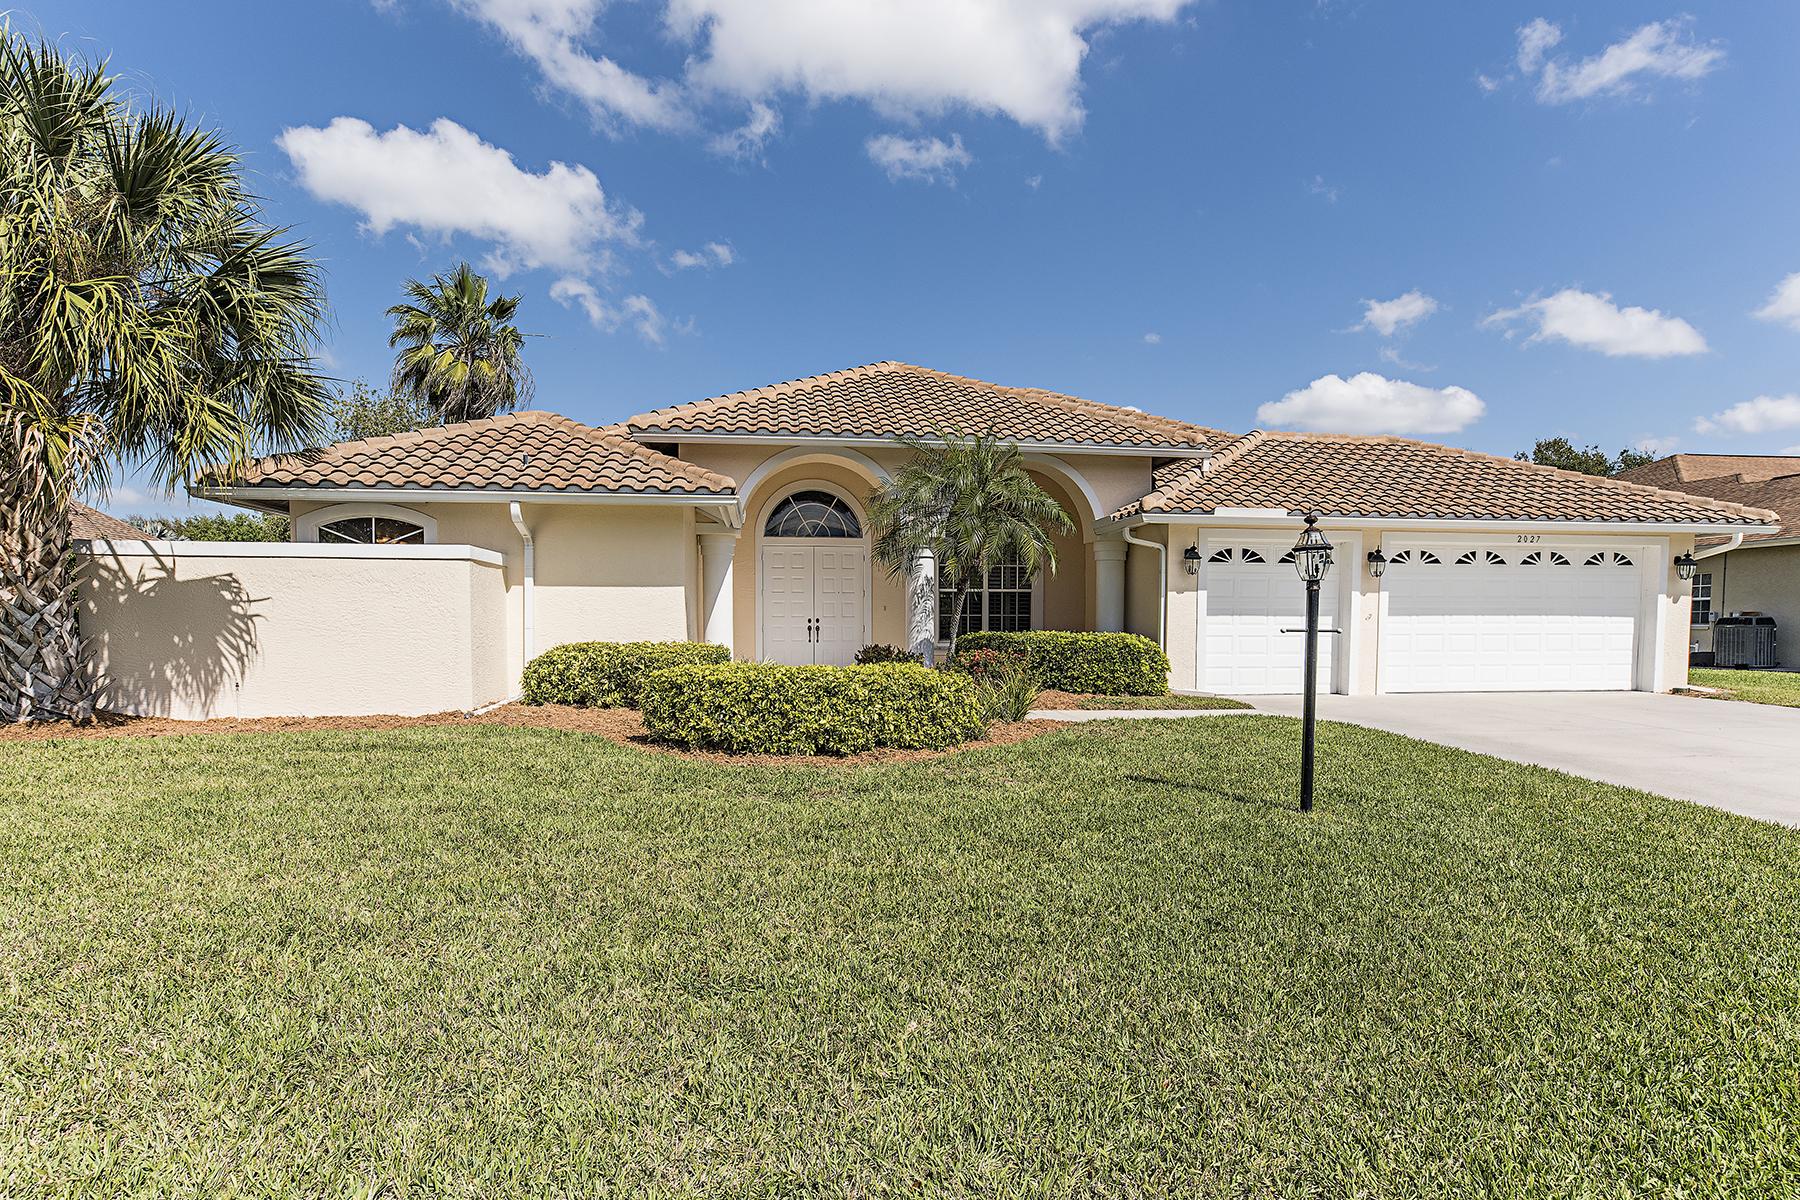 Single Family Home for Sale at Naples 2027 Teagarden Ln, Naples, Florida 34110 United States